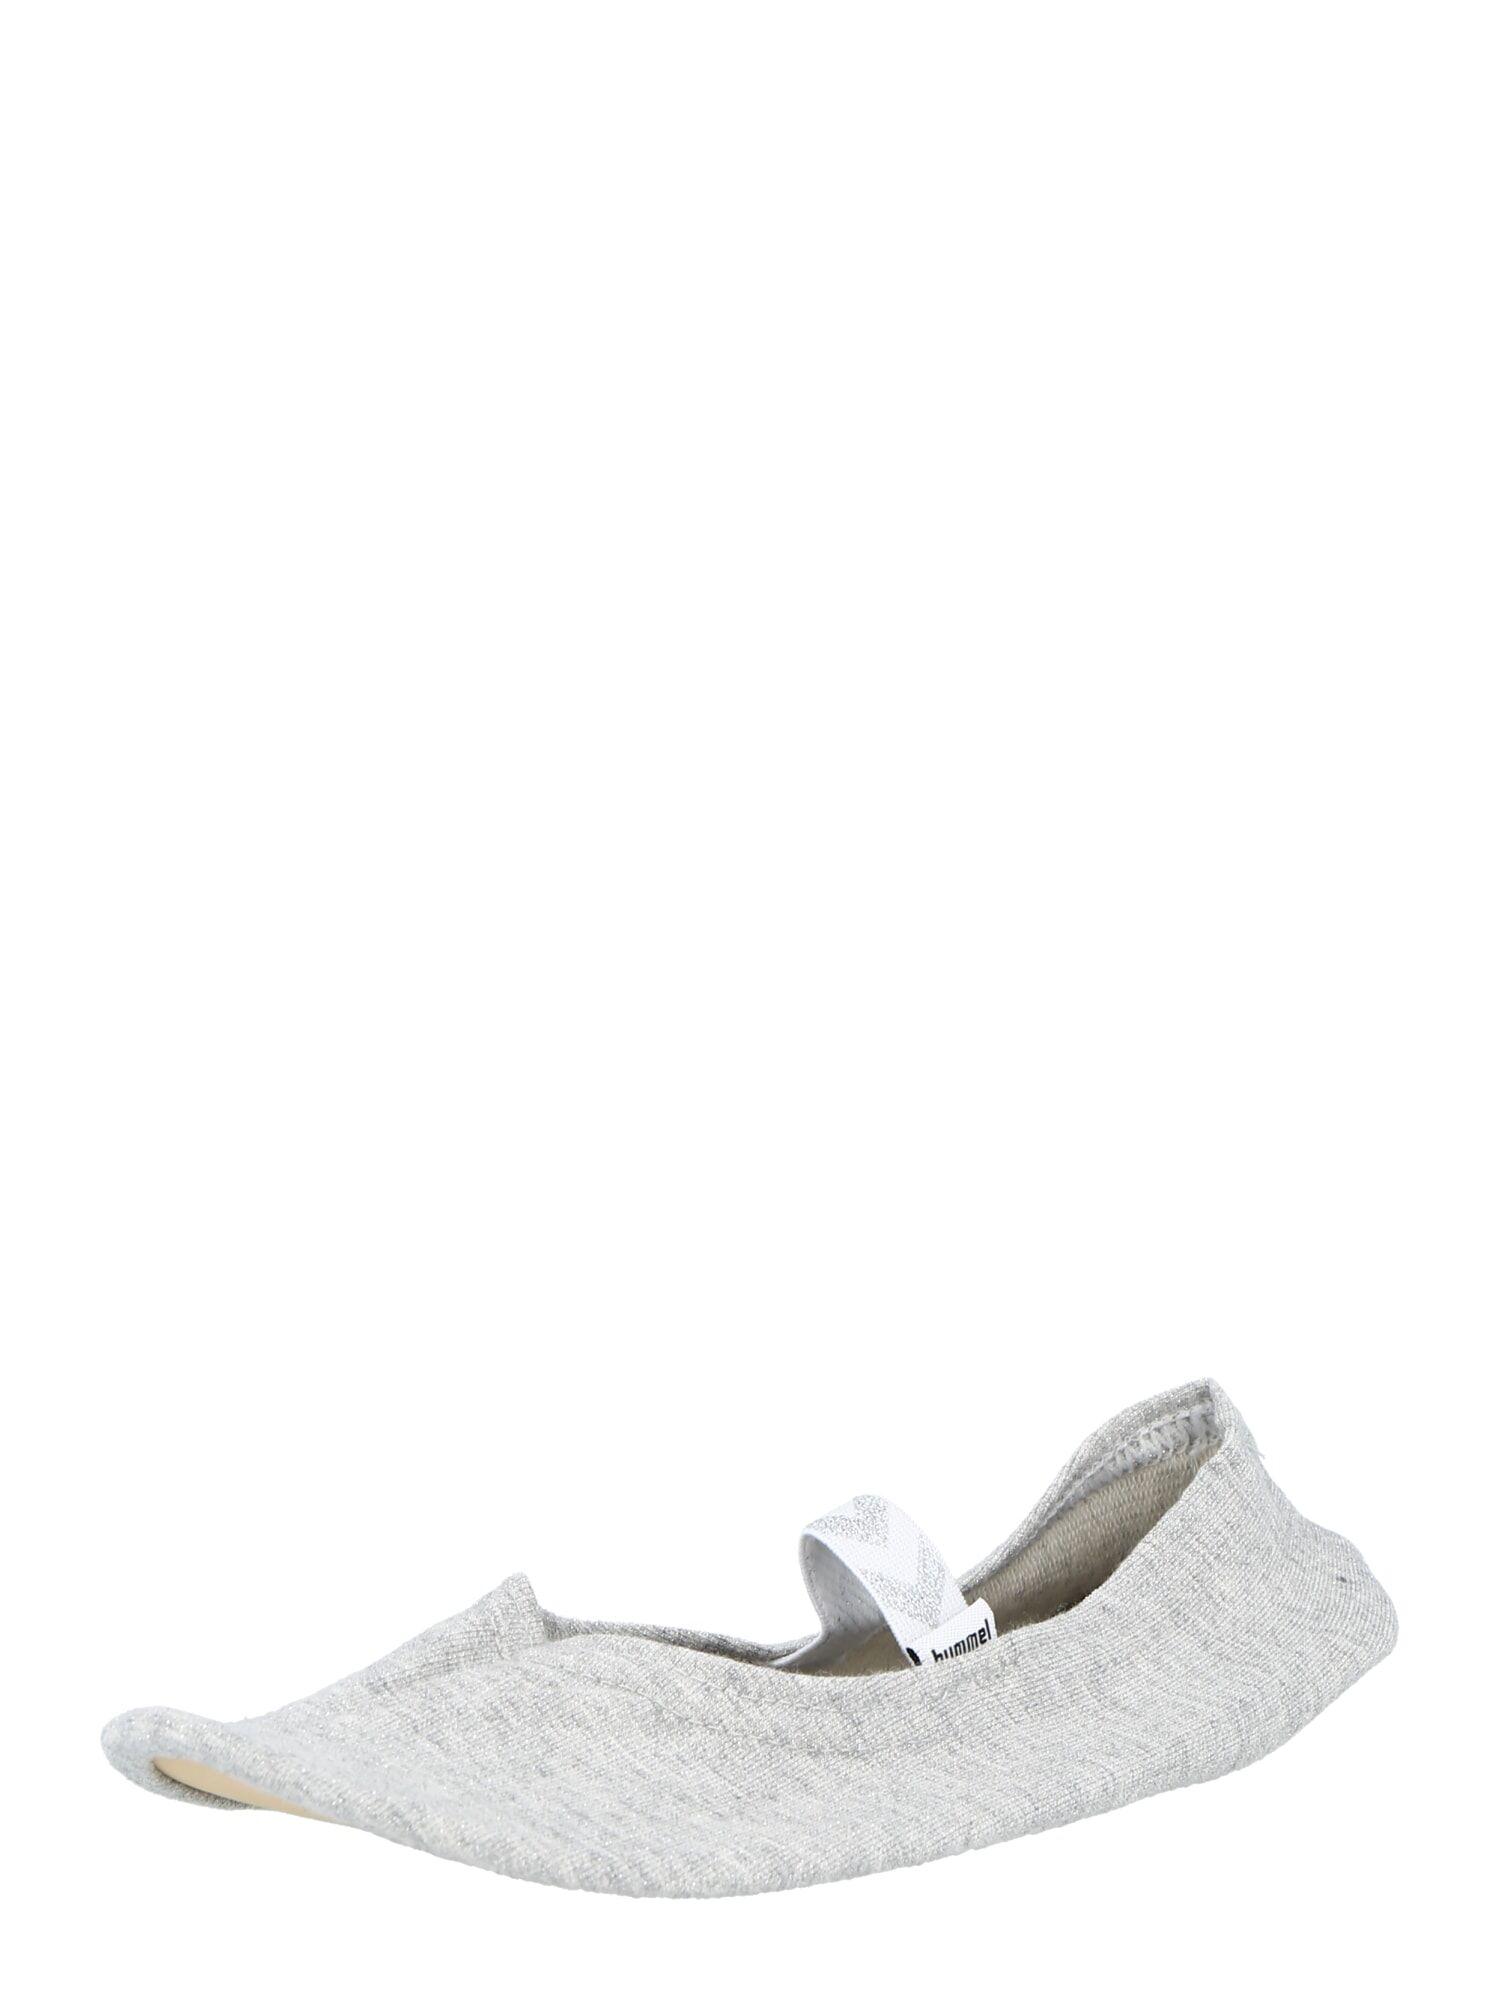 Hummel Chaussure de sport  - Gris - Taille: 29 - boy